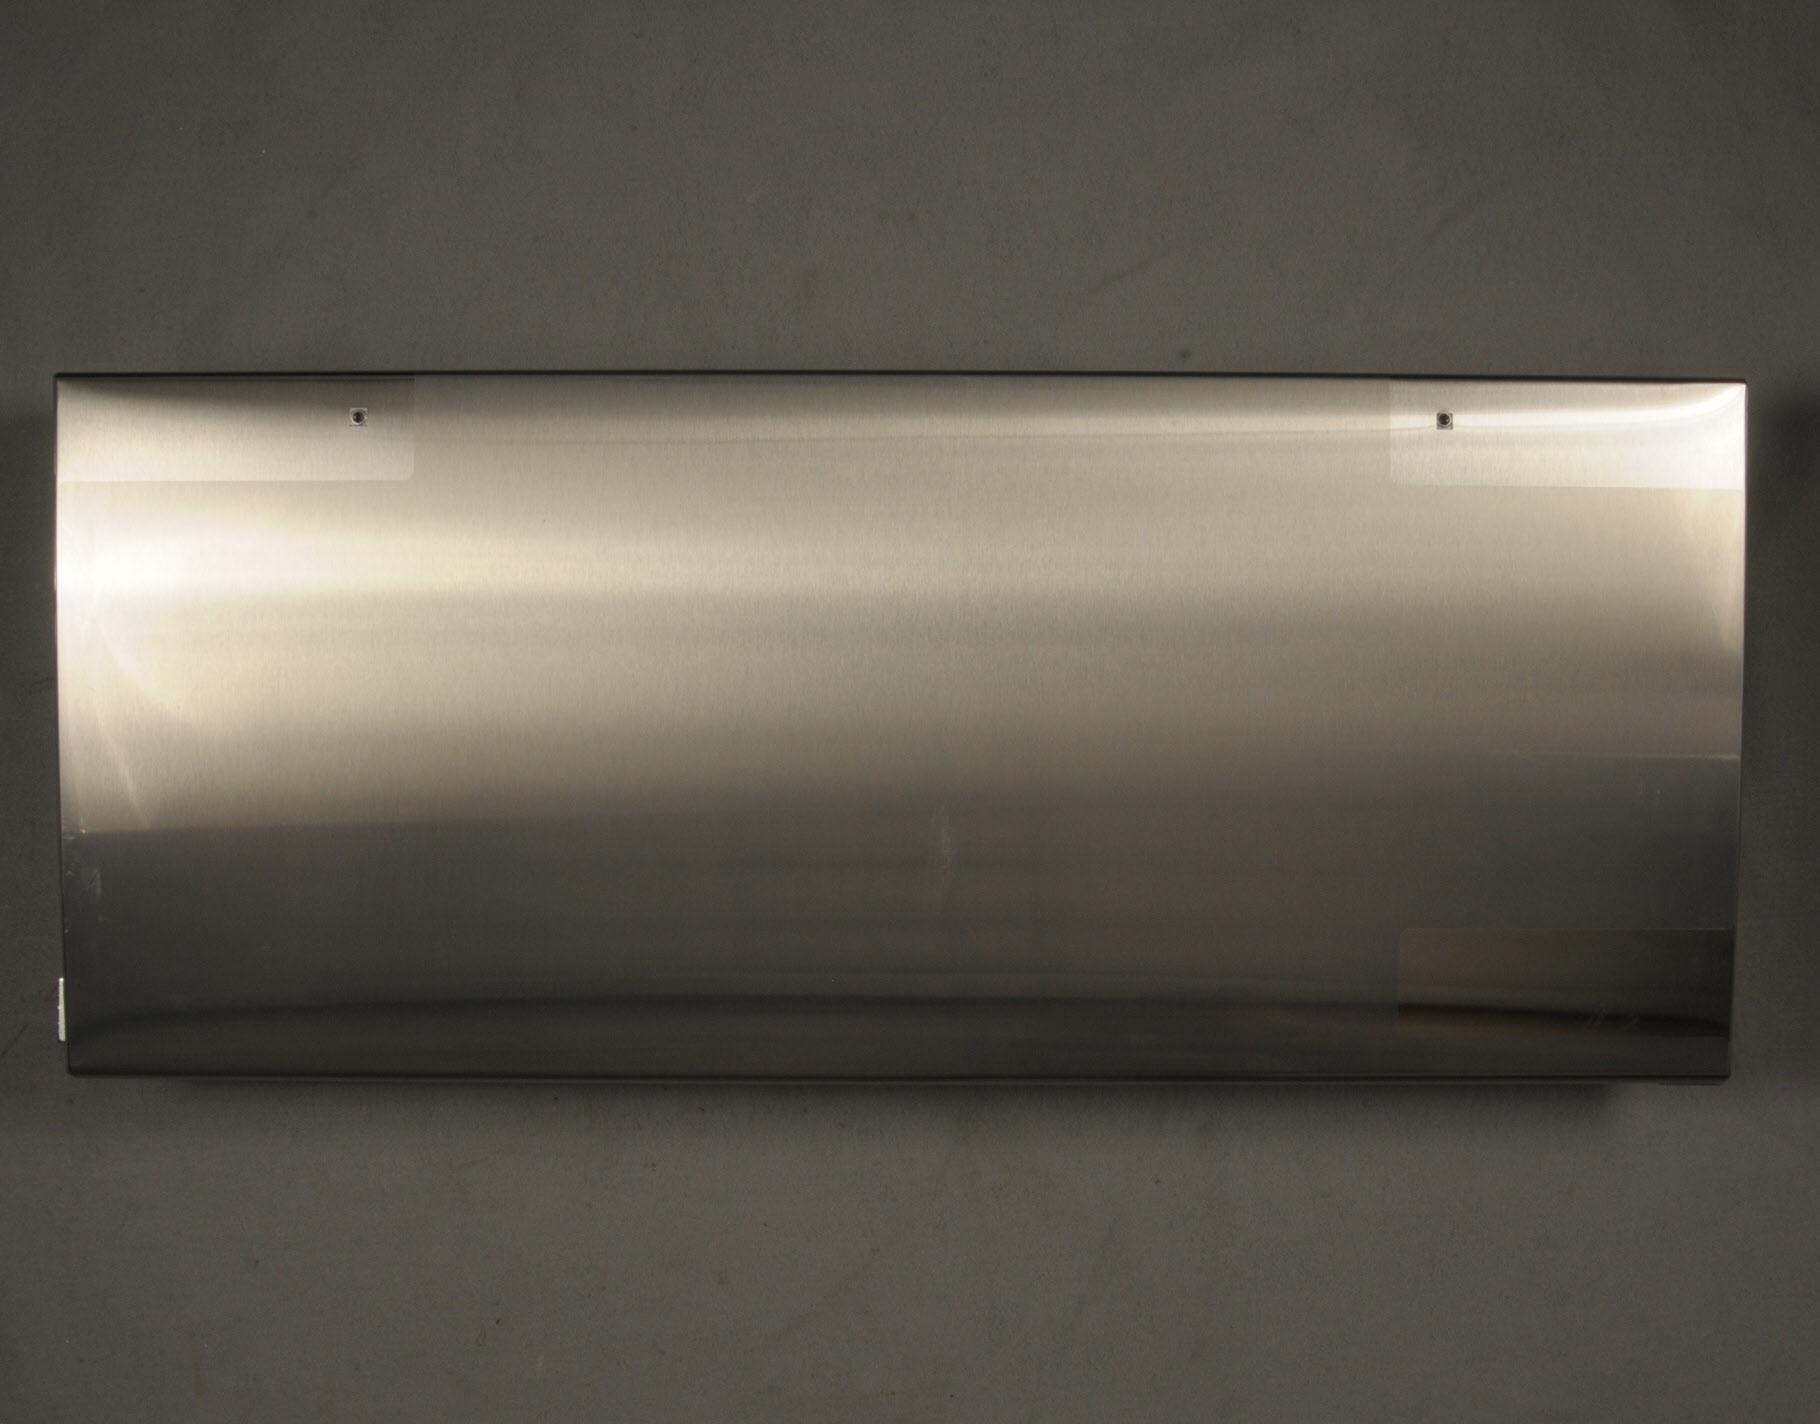 LG Refrigerator Part # ADD73358315 - Door